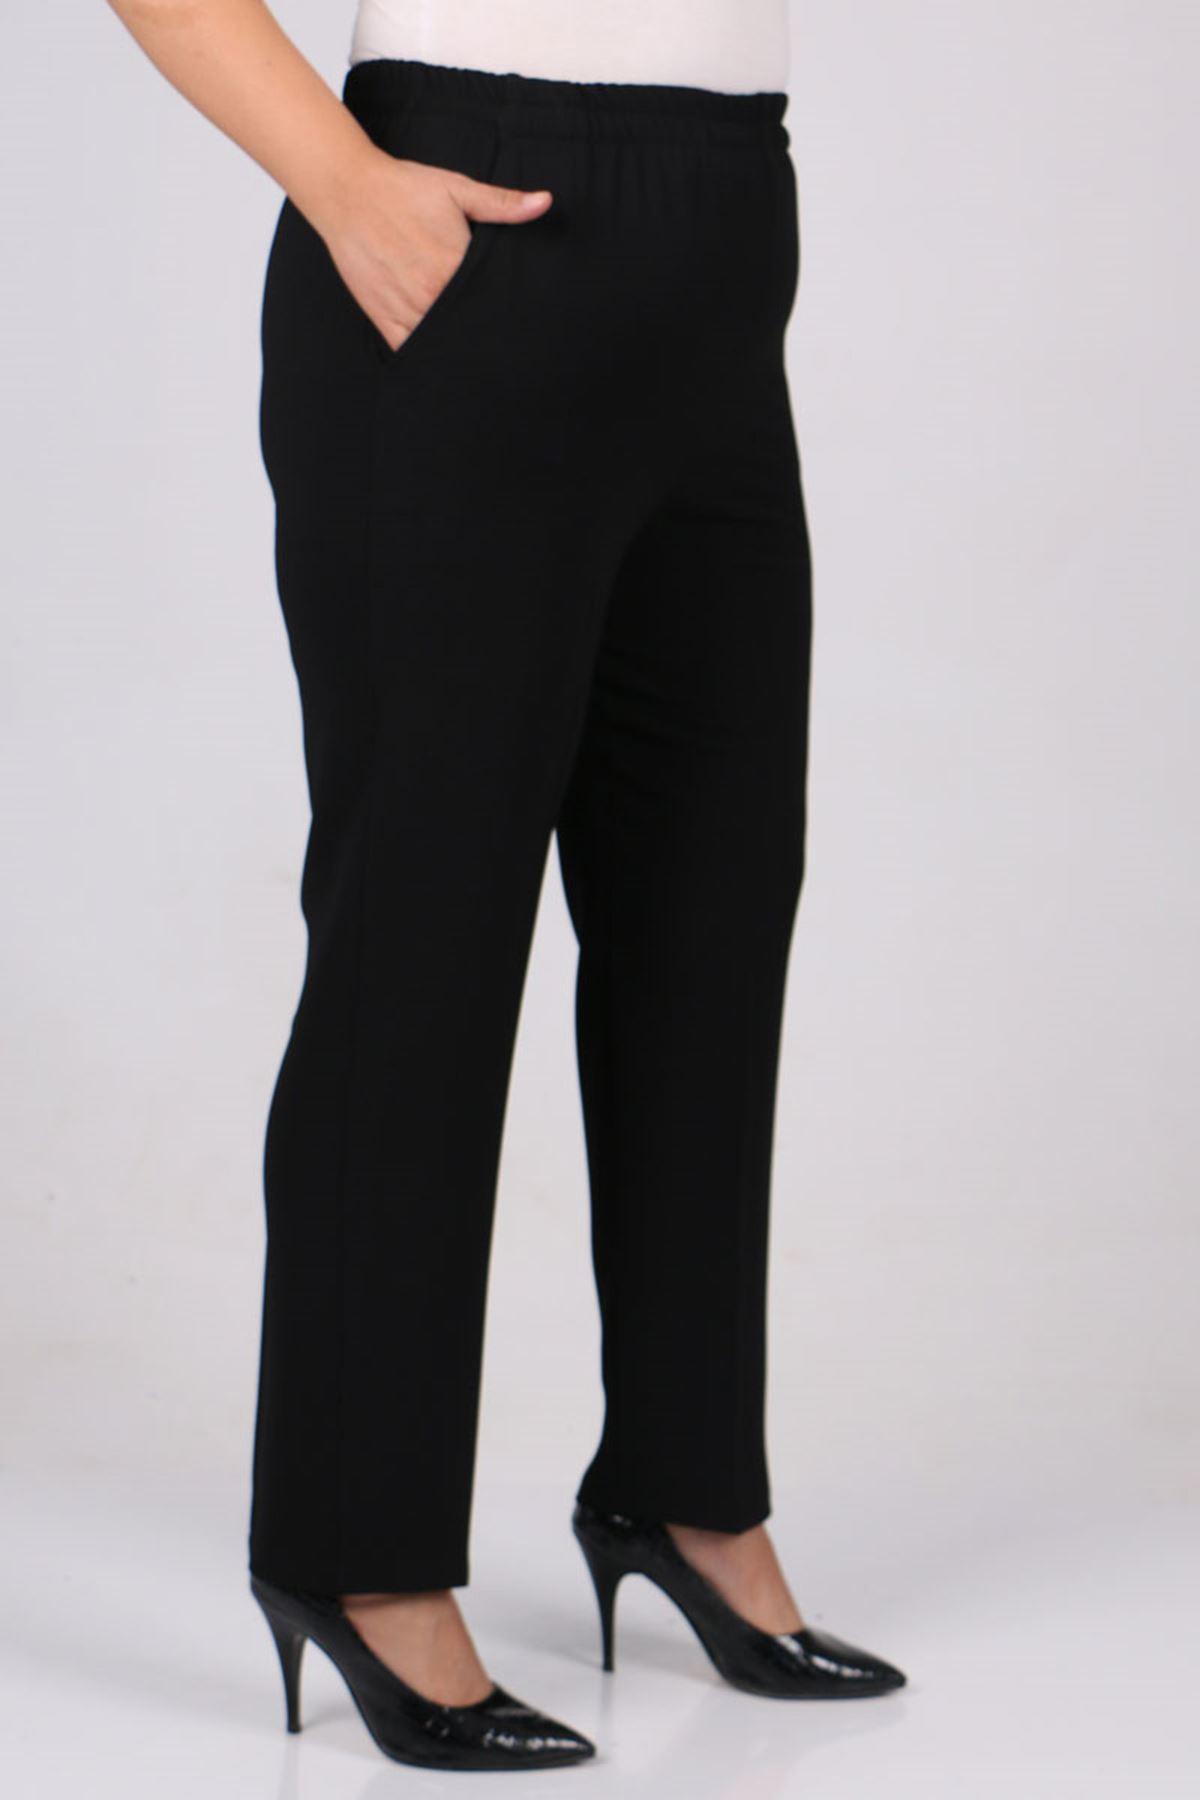 9172 Büyük Beden Beli Lastikli Boru Paça Pantolon - Siyah